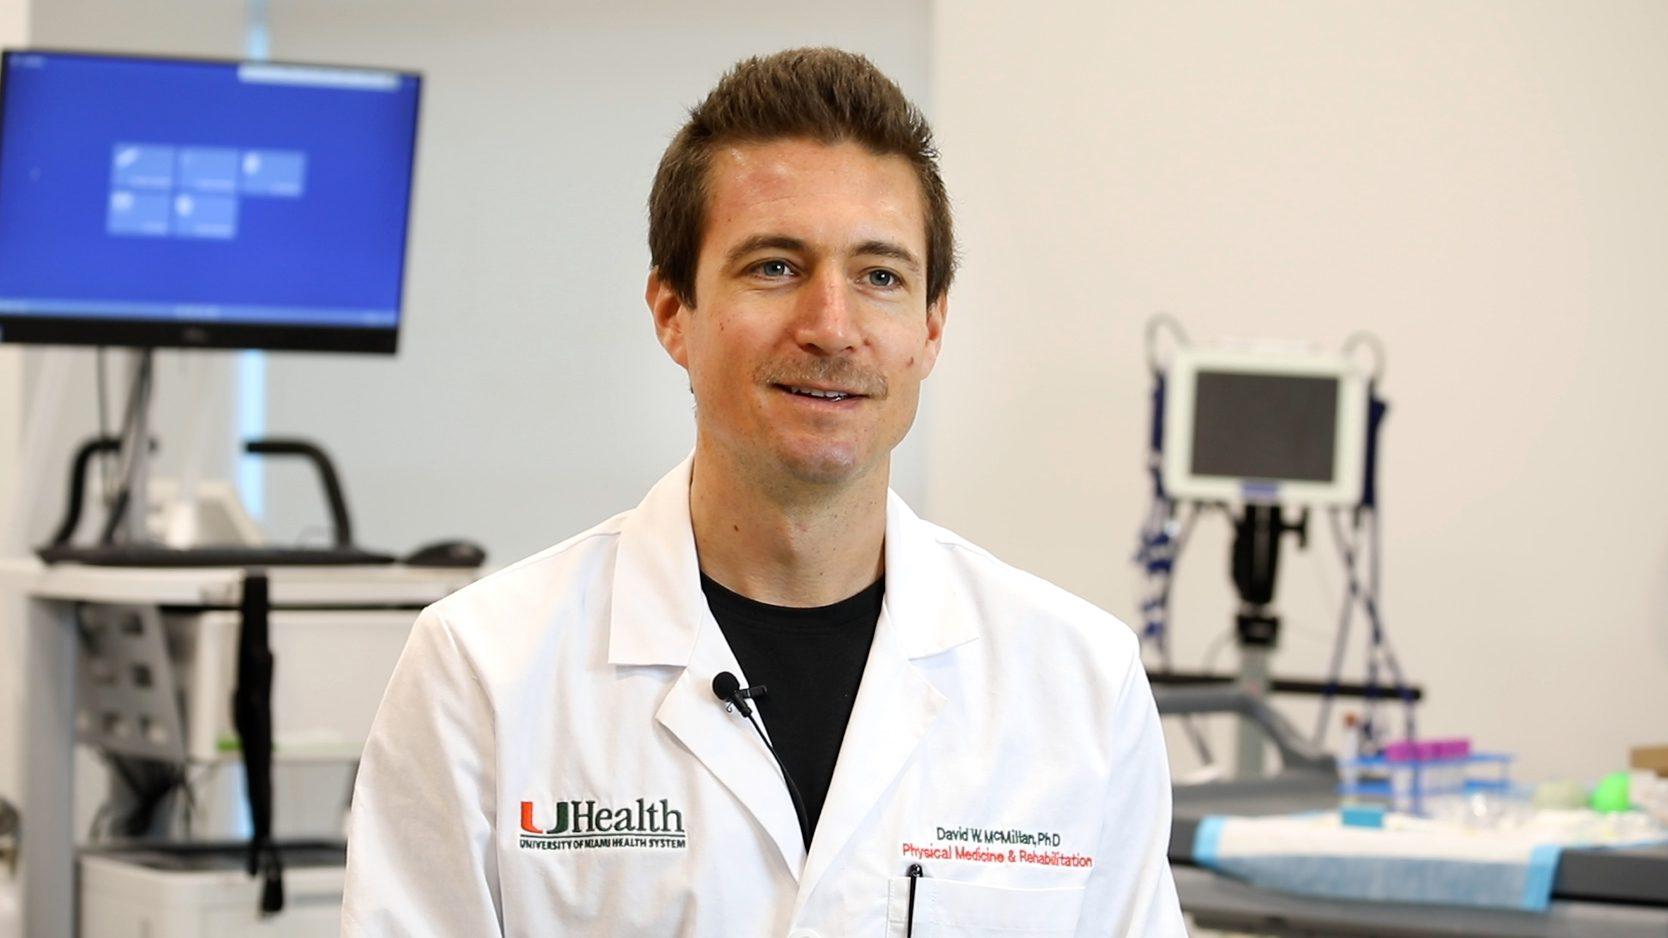 Meet the Researcher – Dr. David McMillan